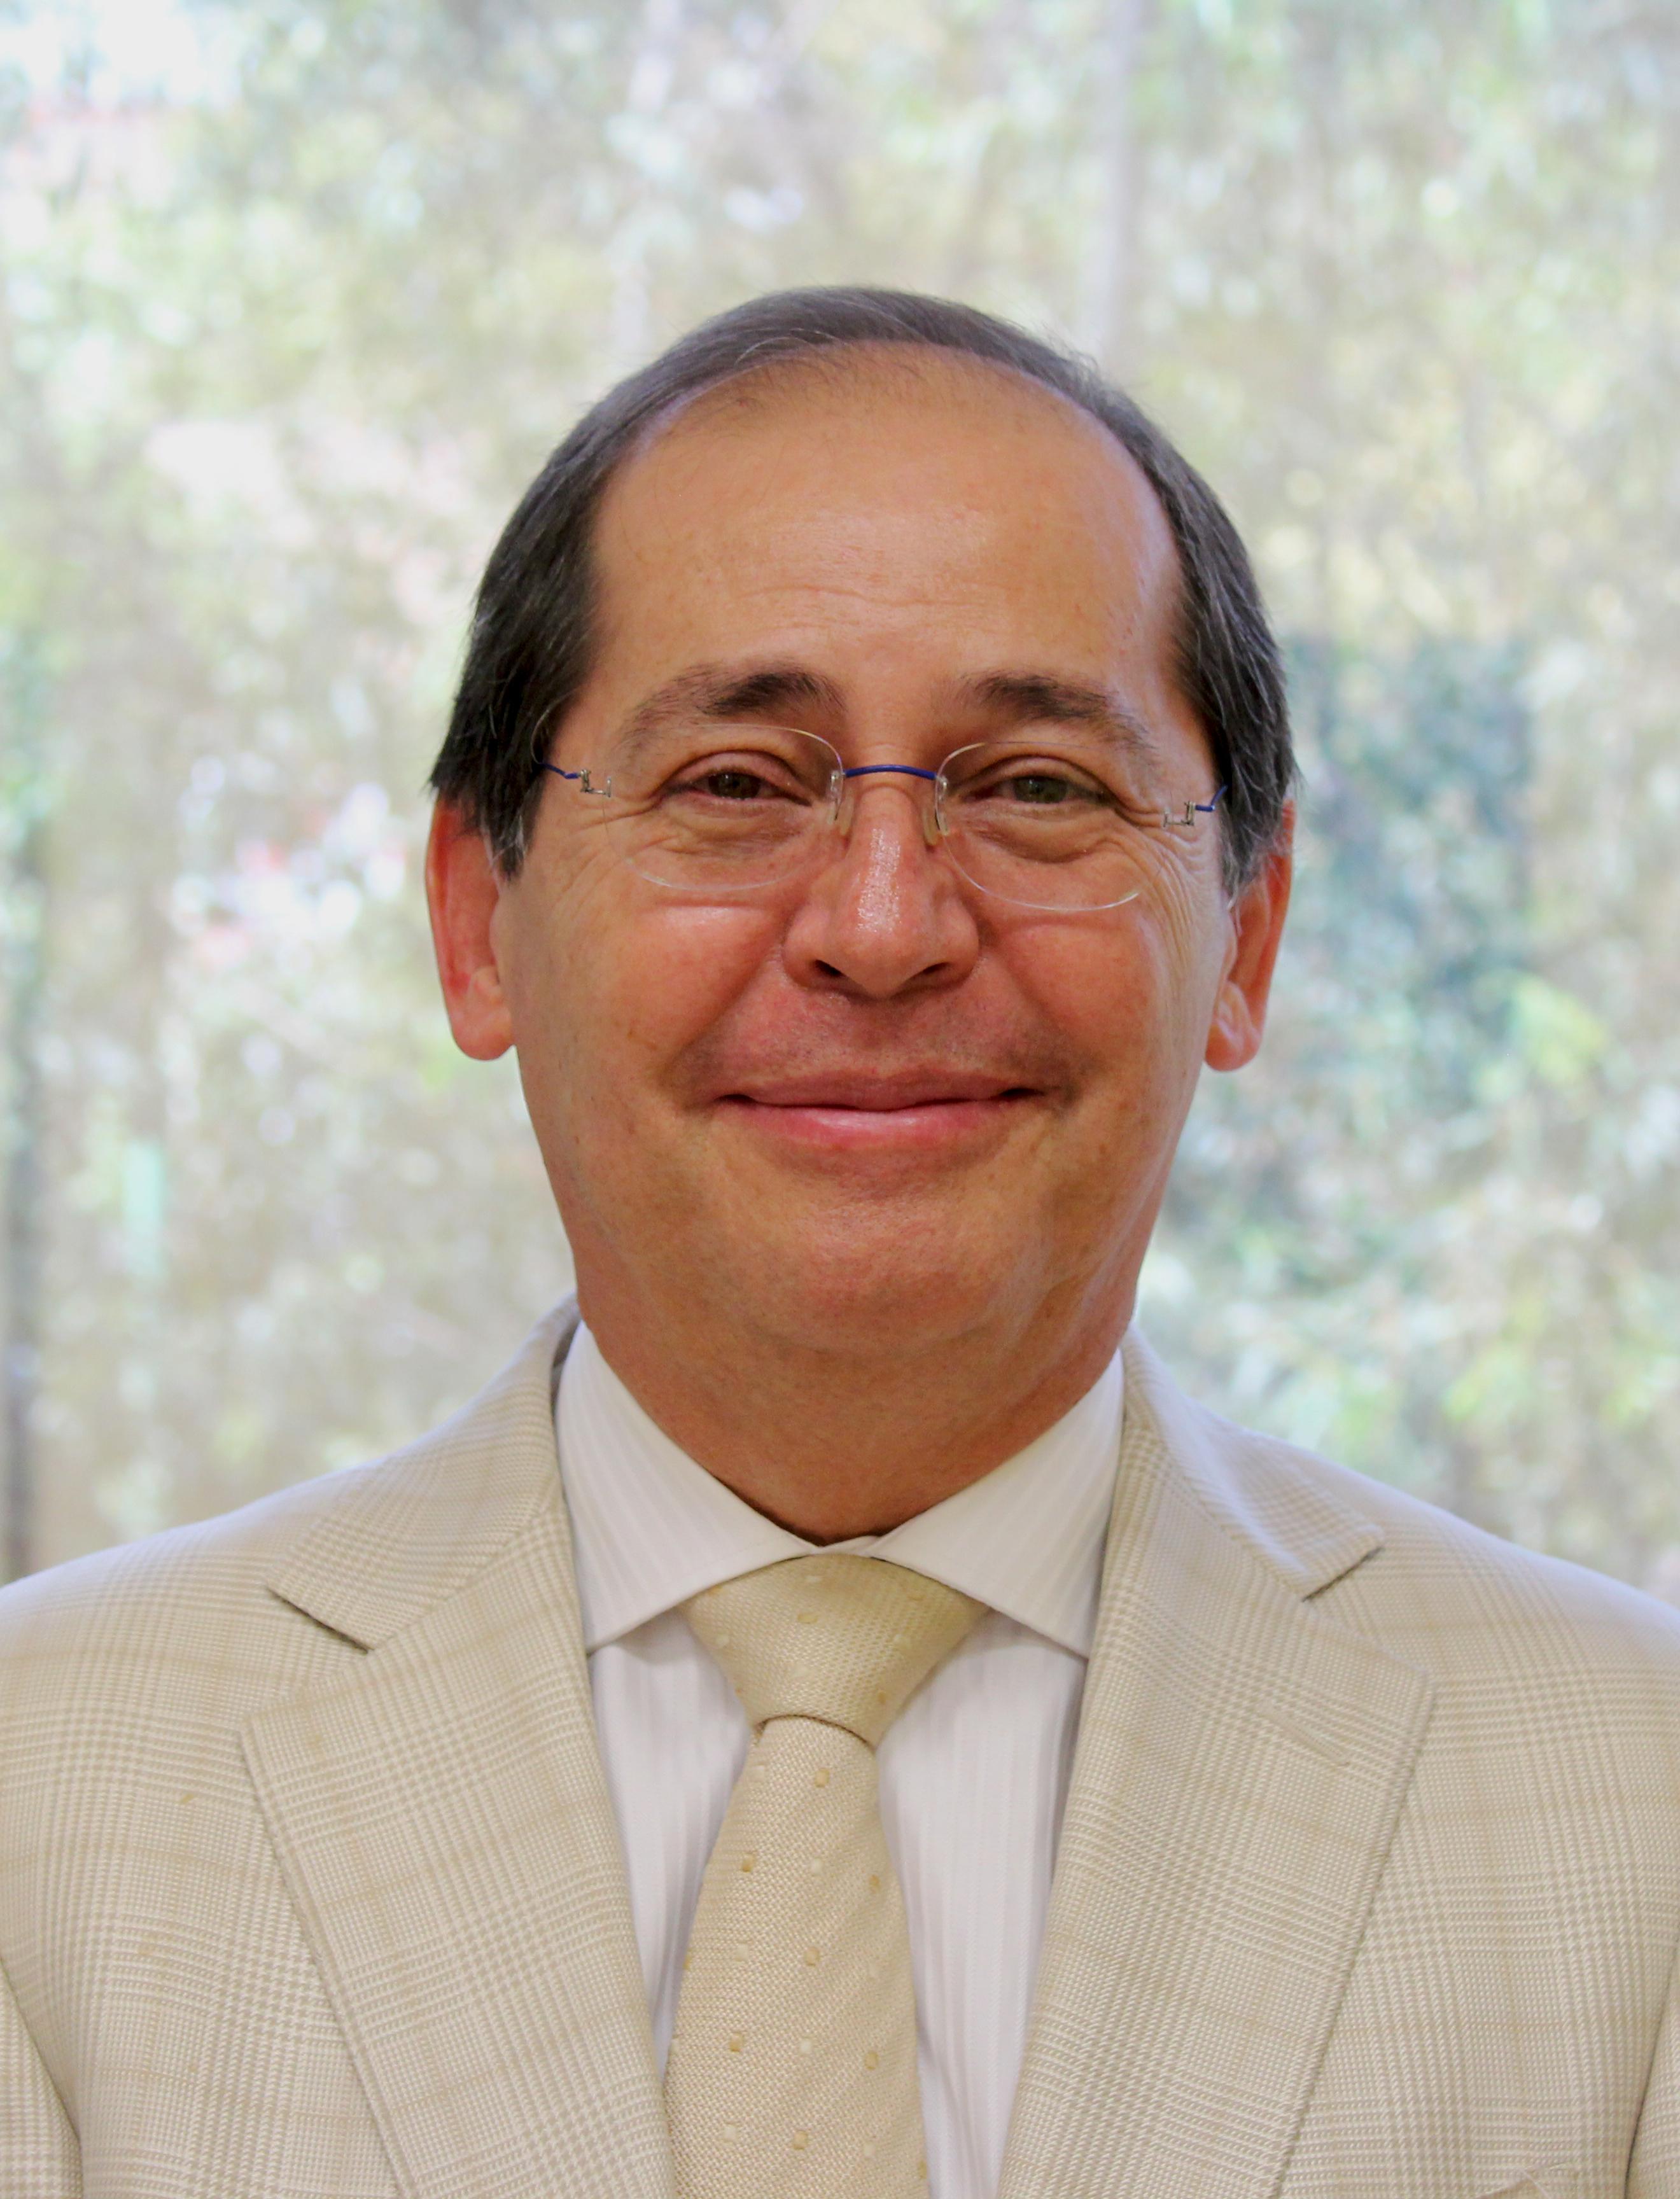 José Humberto Corona Mercado